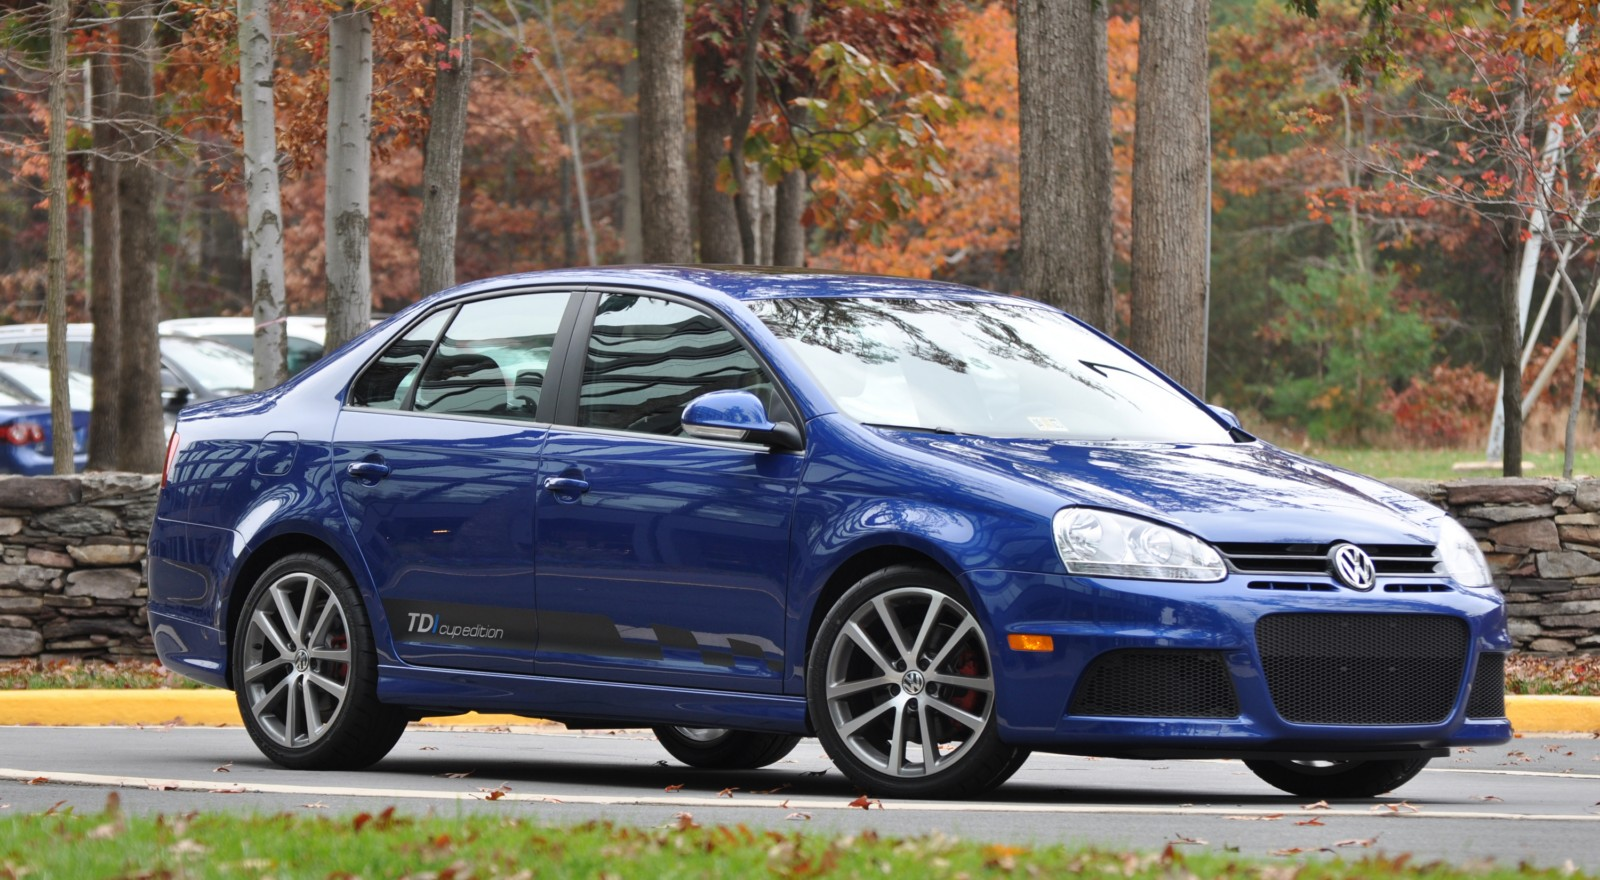 vw dealers  diesel buyback  offer deals   tdi owners bring  cars